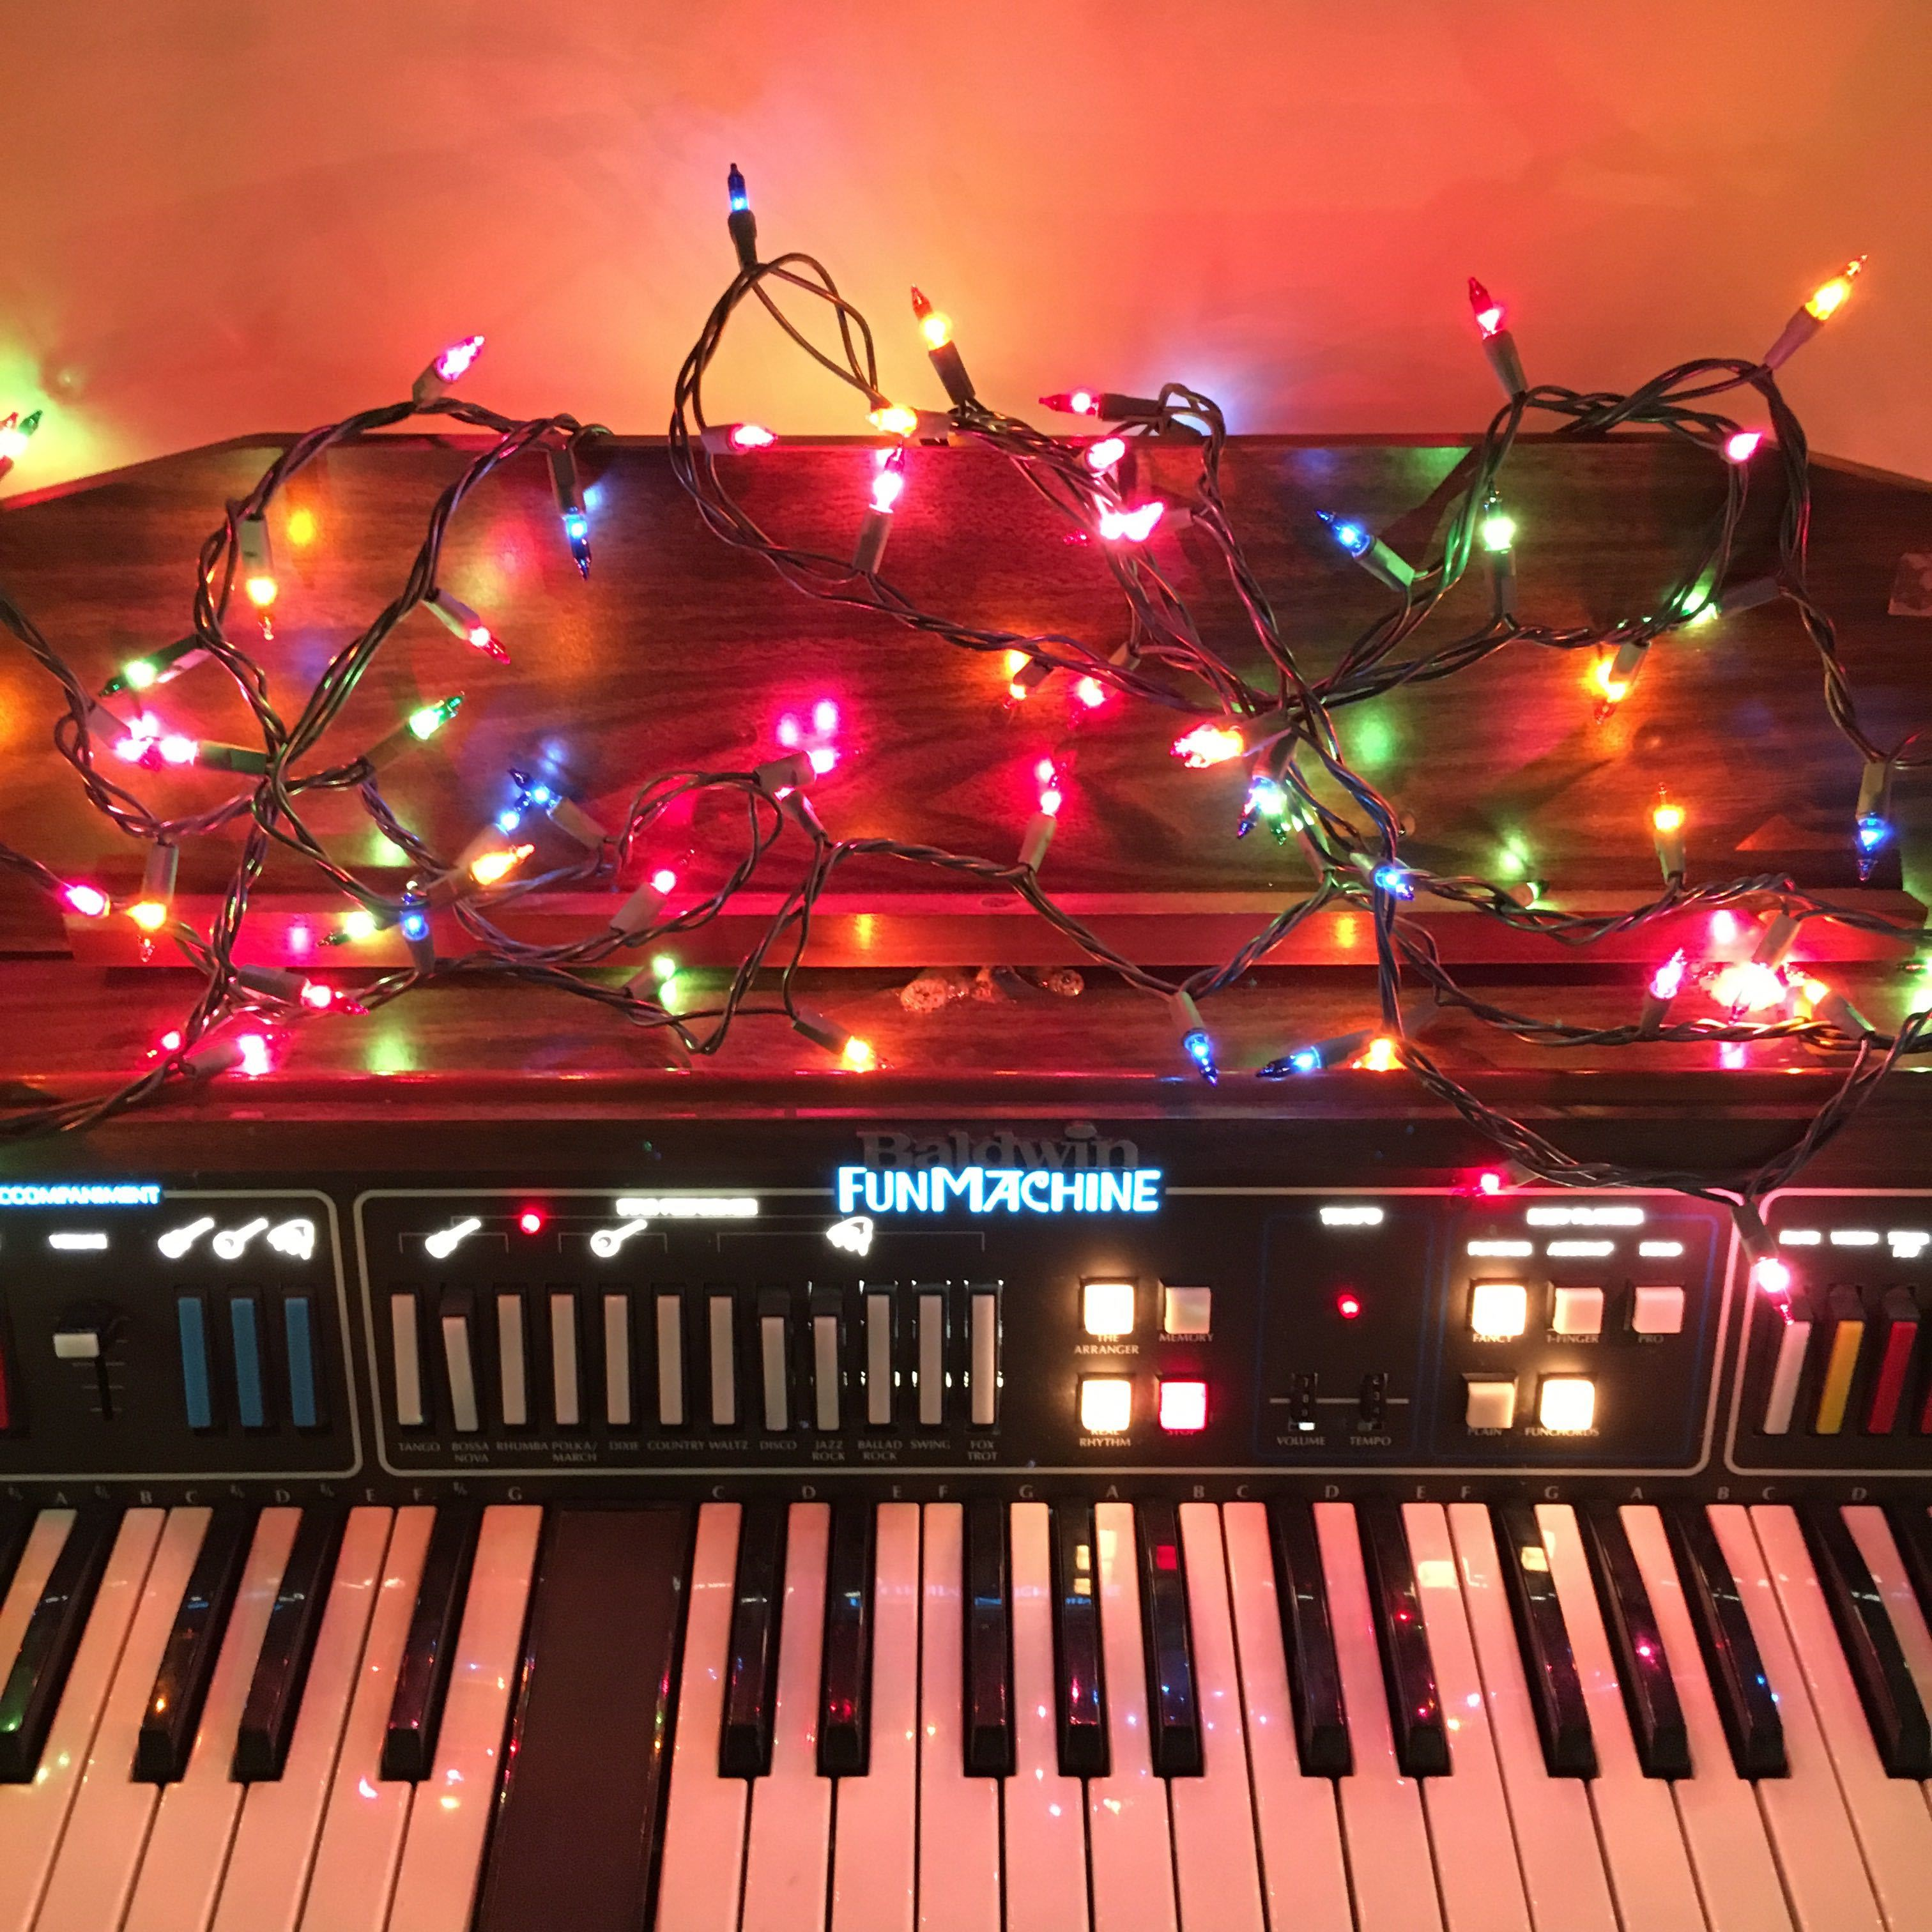 A vintage Baldwin Fun Machine covered in lights